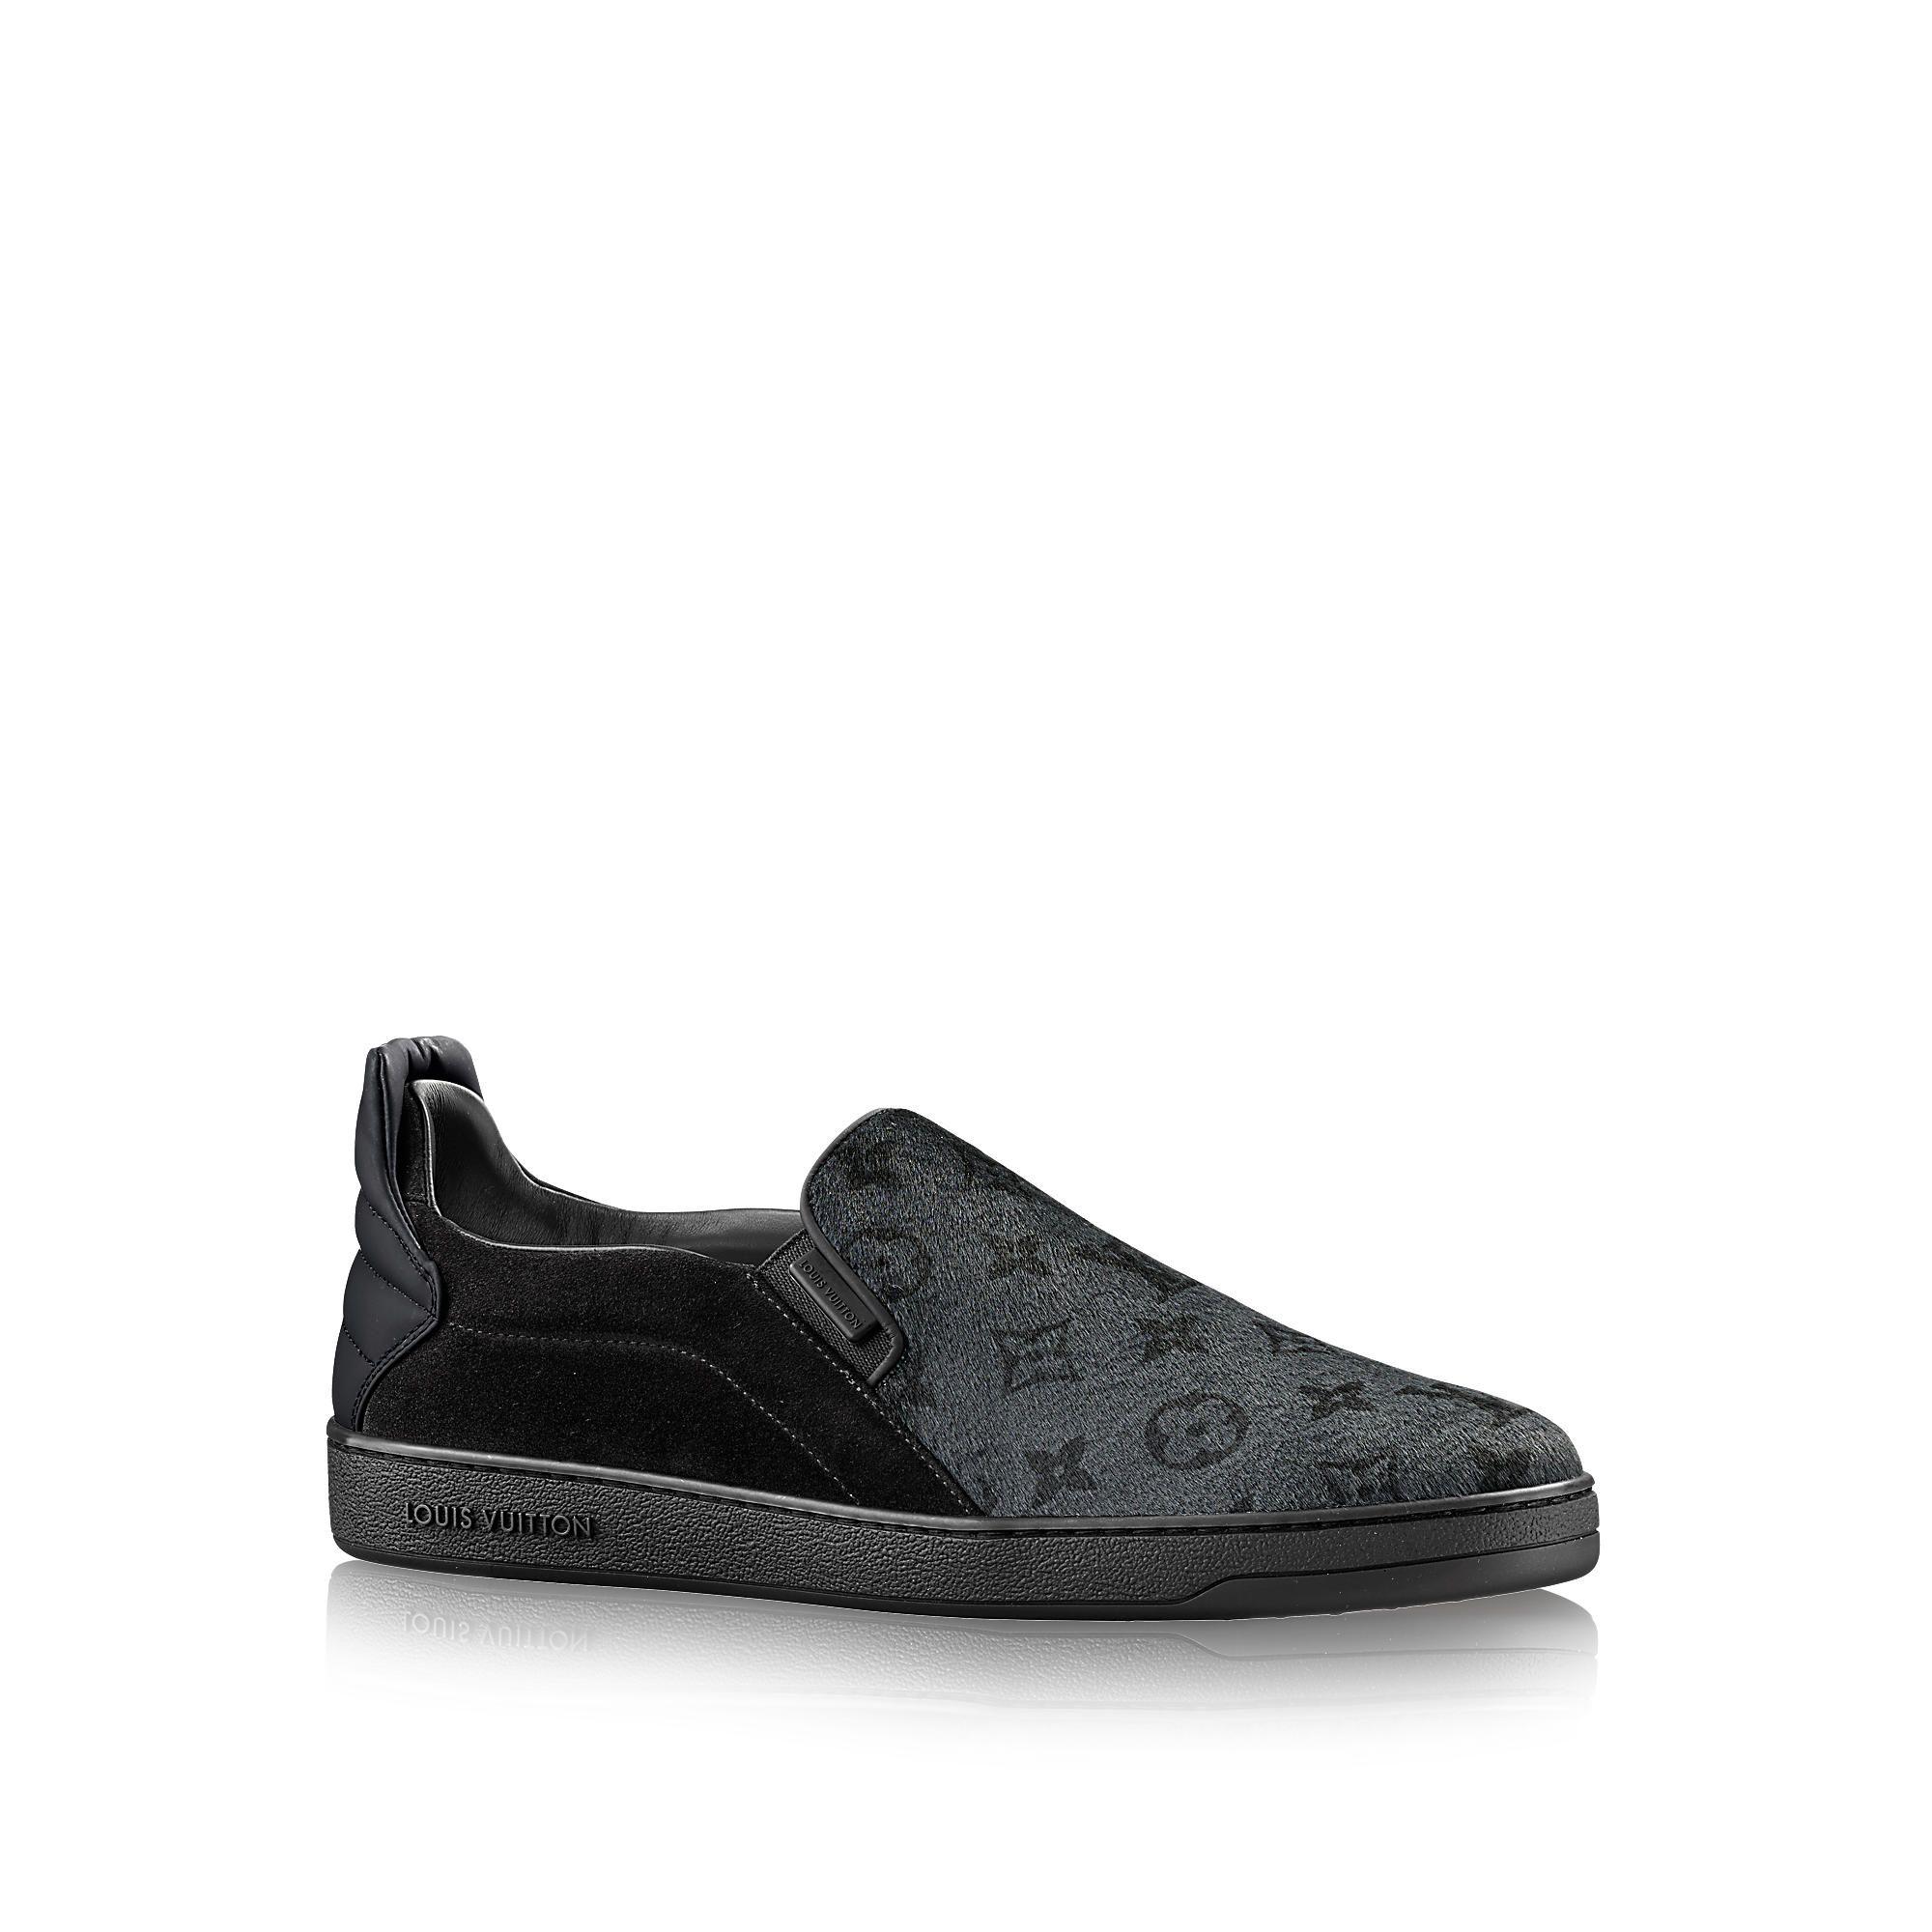 Discover Louis Vuitton Frontrow Slip-On via Louis Vuitton